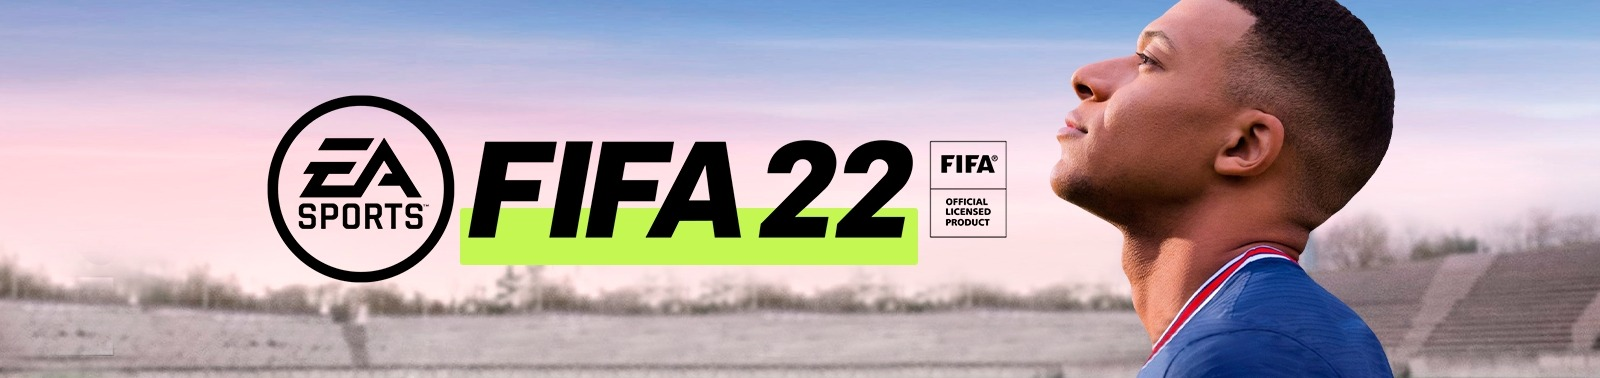 FIFA 22 Key für PC, PS5, PS4, Xbox Series X/S und Xbox One